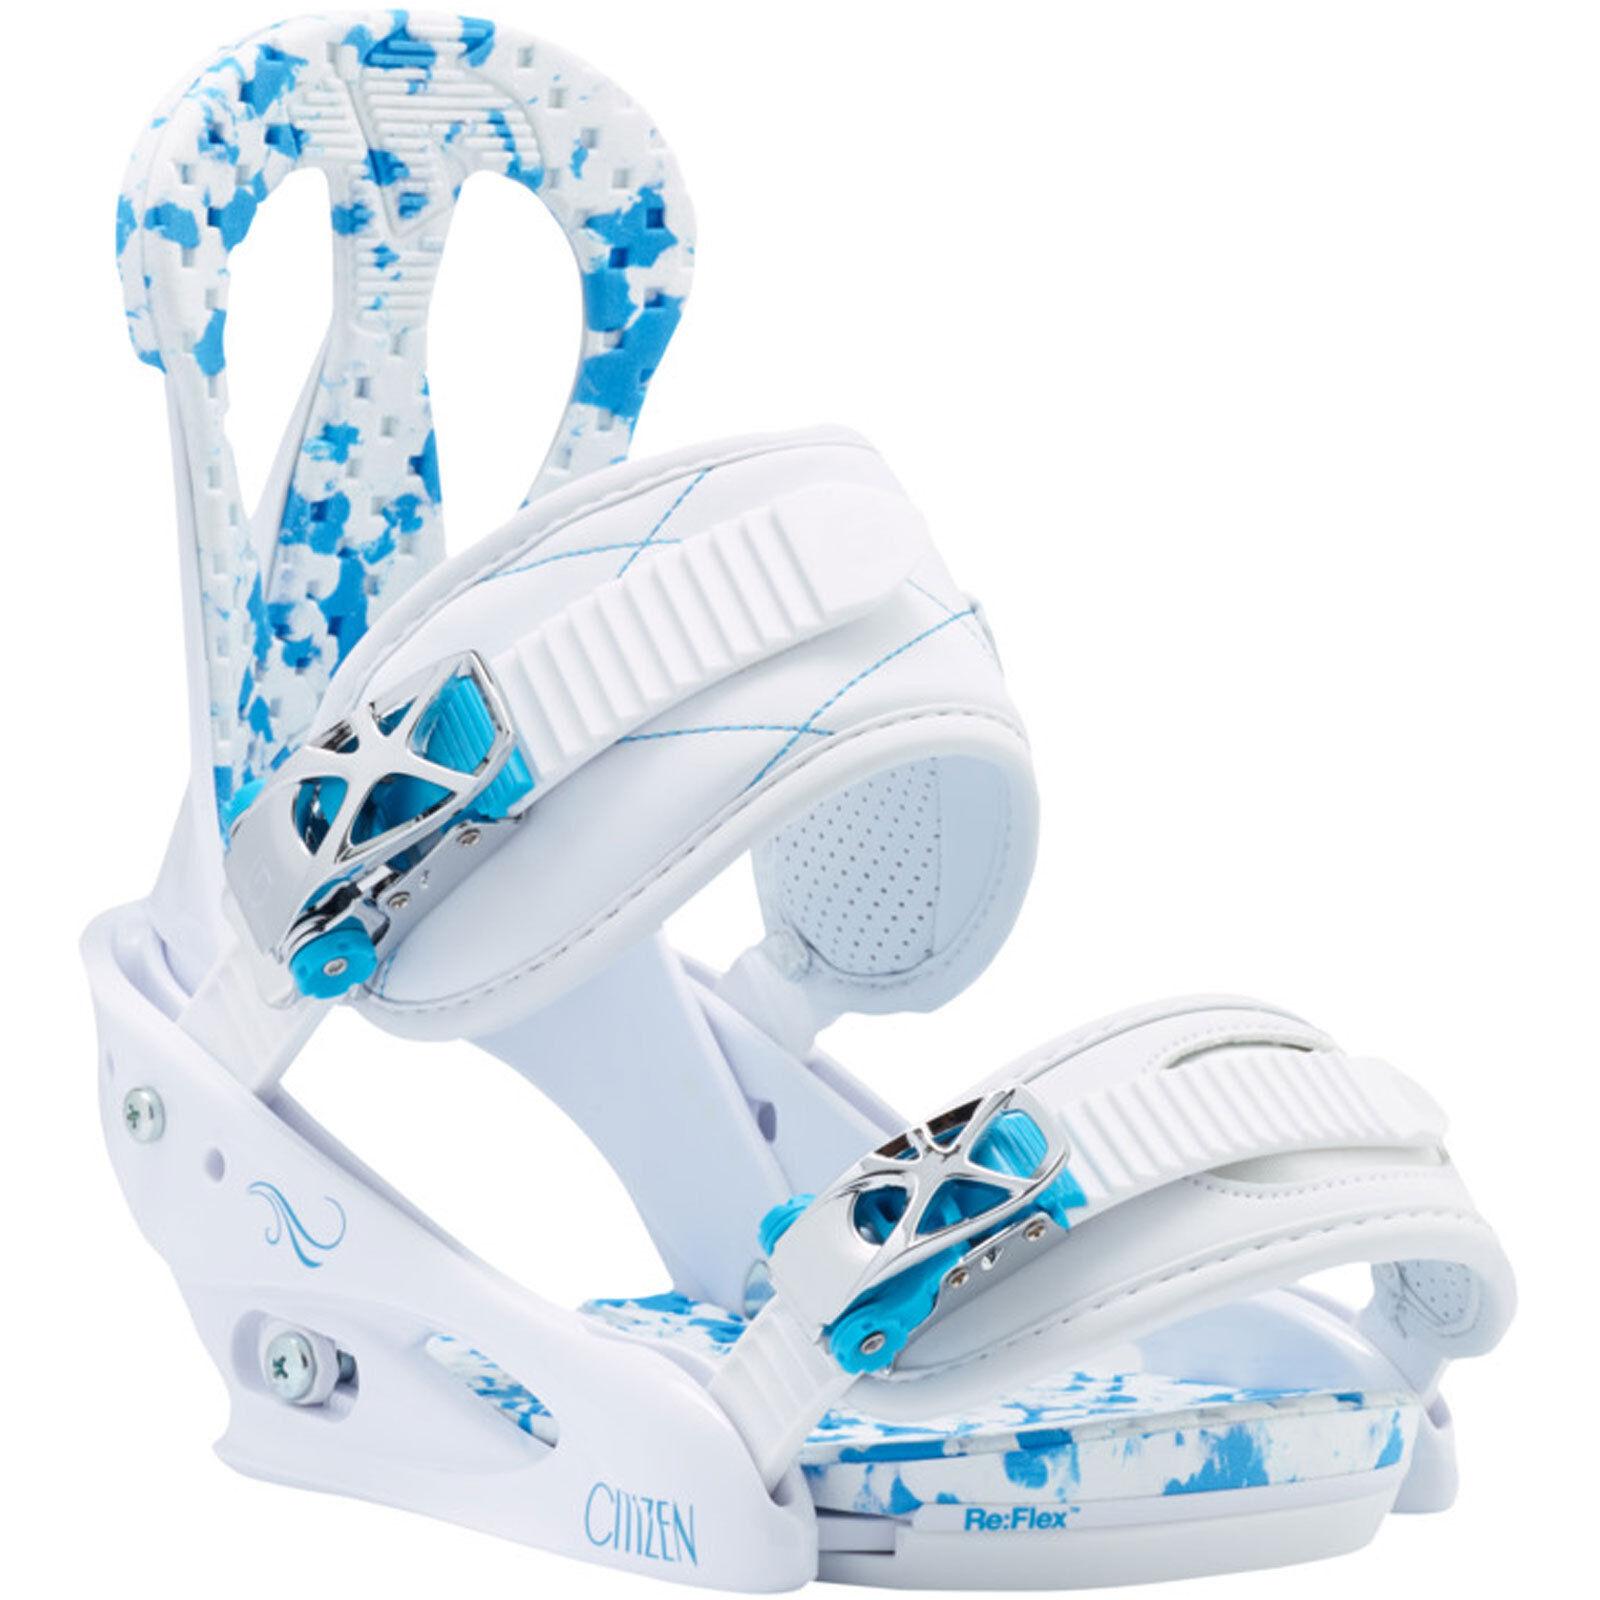 Burton Citizen Re Flex Damen Damen Damen Snowboardbindung Snowboard Bindung 2014-2018 NEU  | Sonderkauf  5ff236